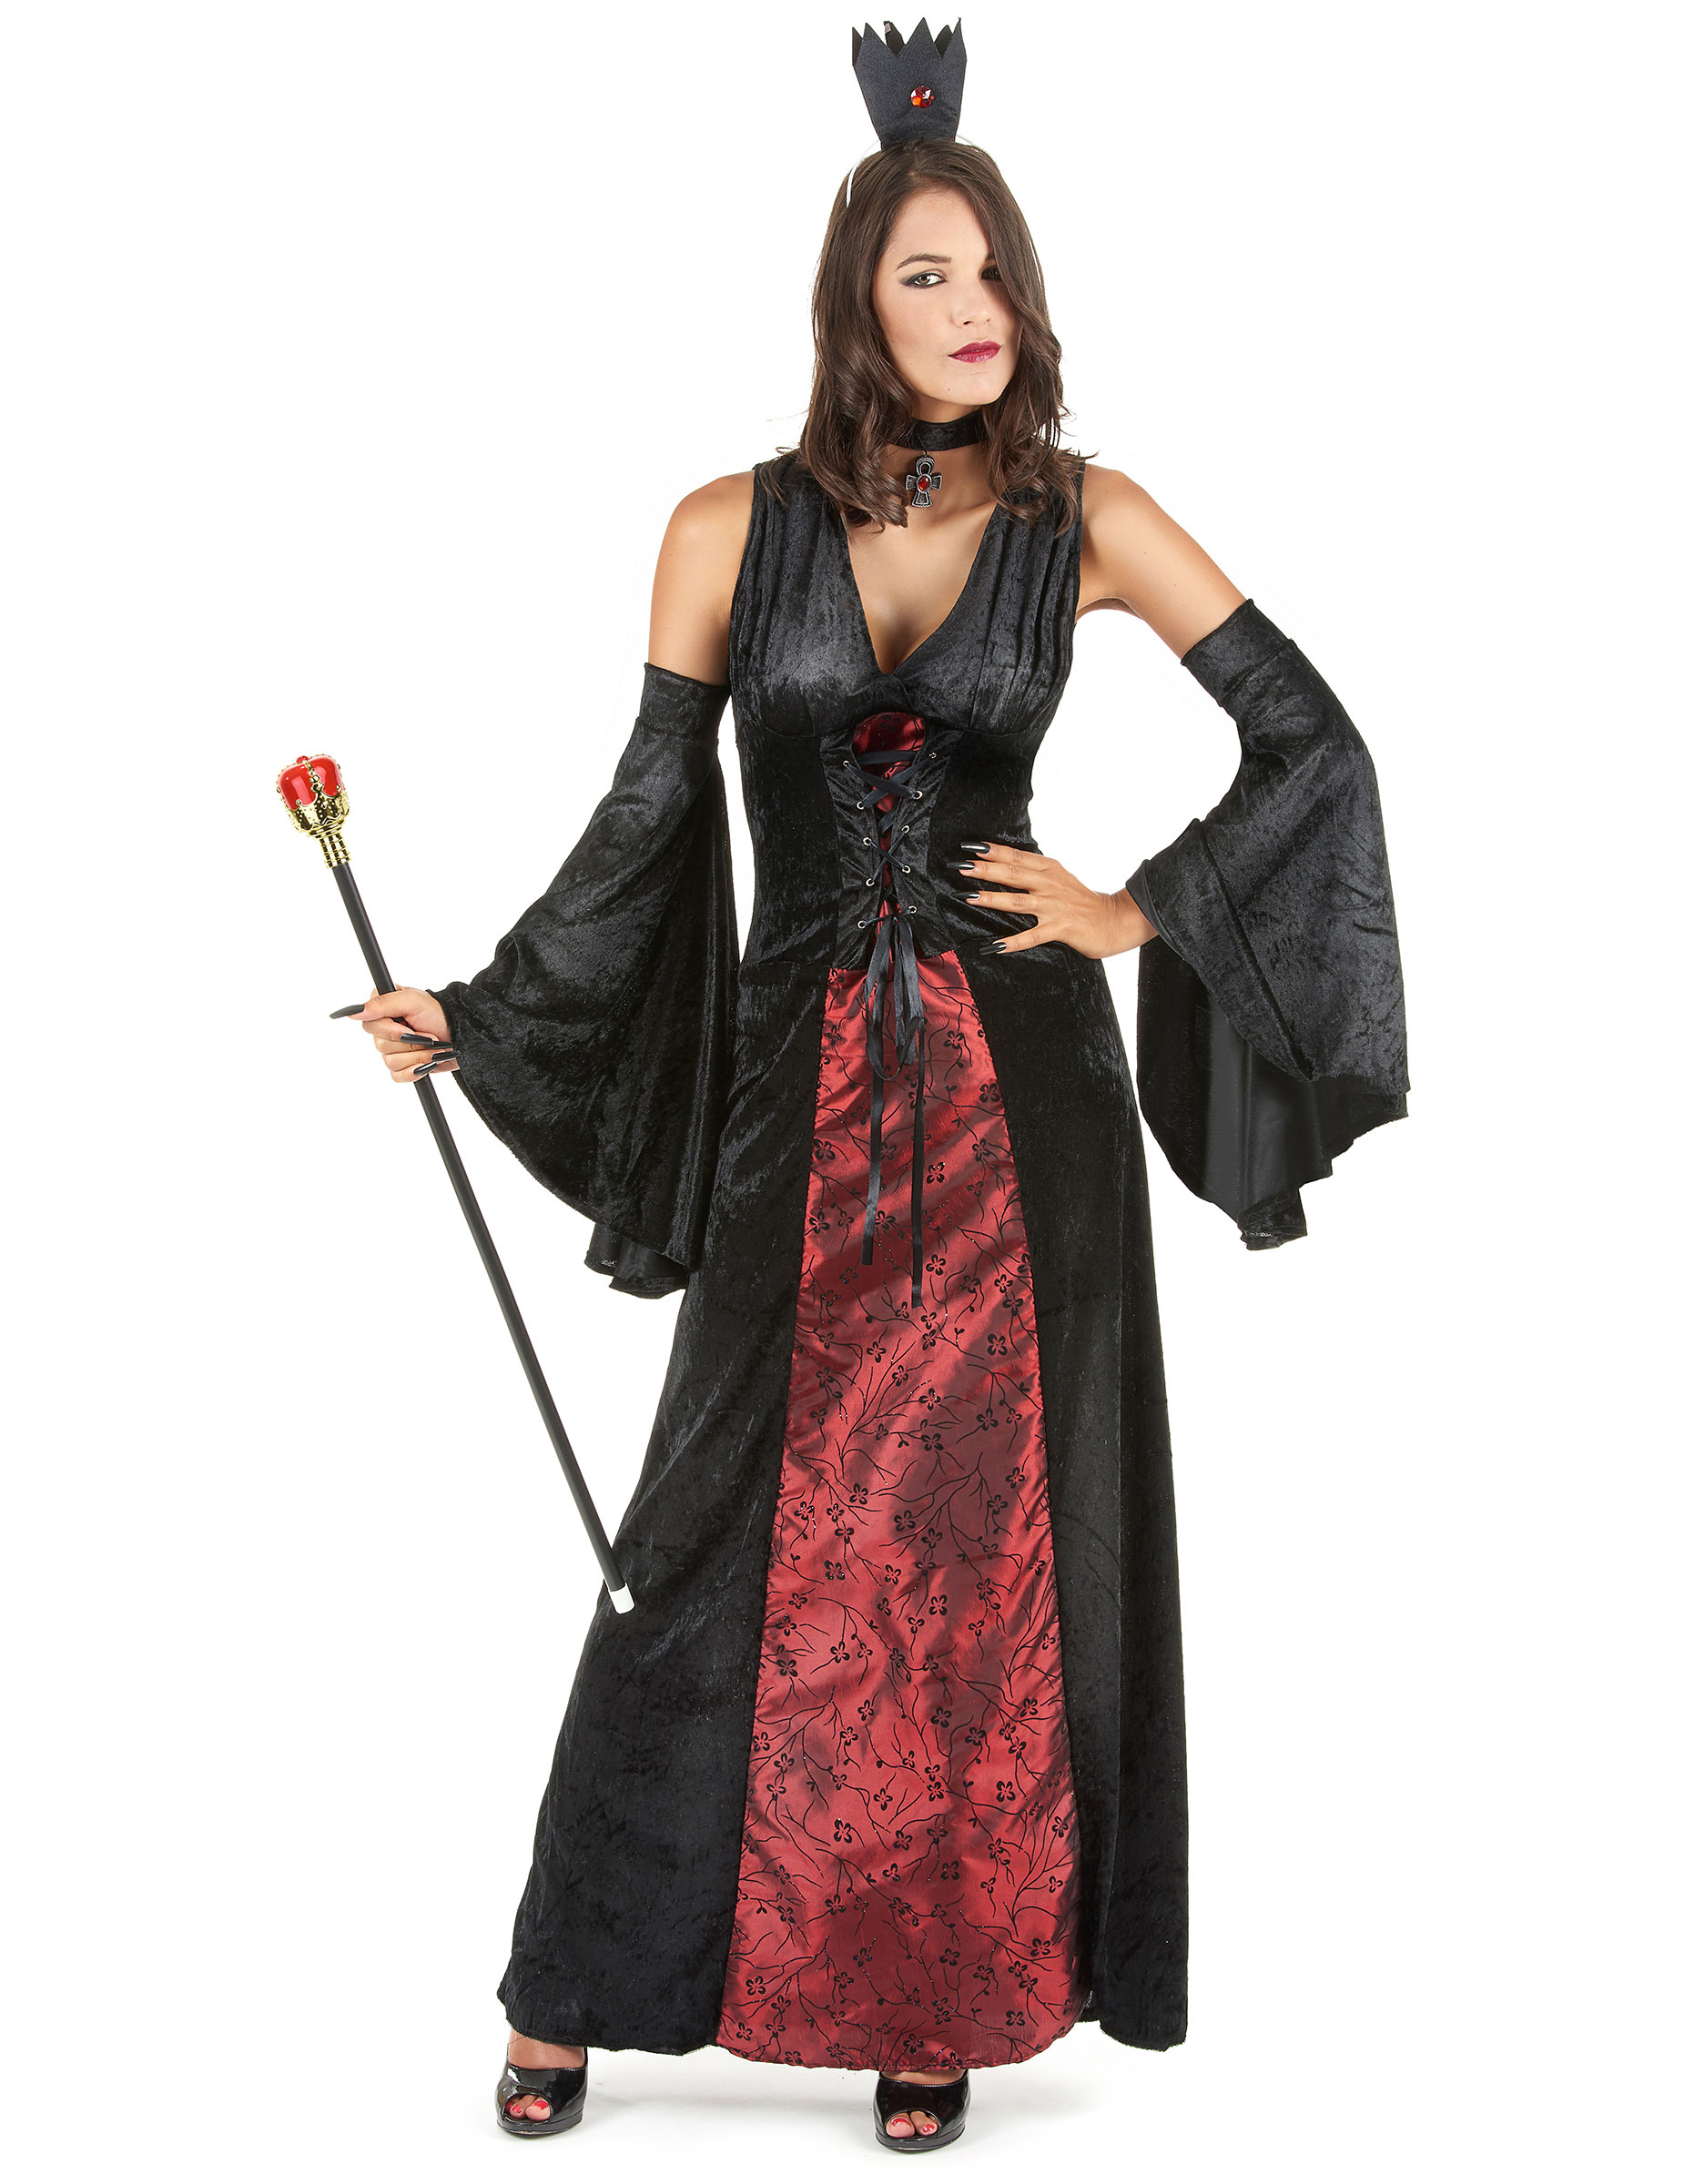 vampir kost m f r damen kost me f r erwachsene und g nstige faschingskost me vegaoo. Black Bedroom Furniture Sets. Home Design Ideas